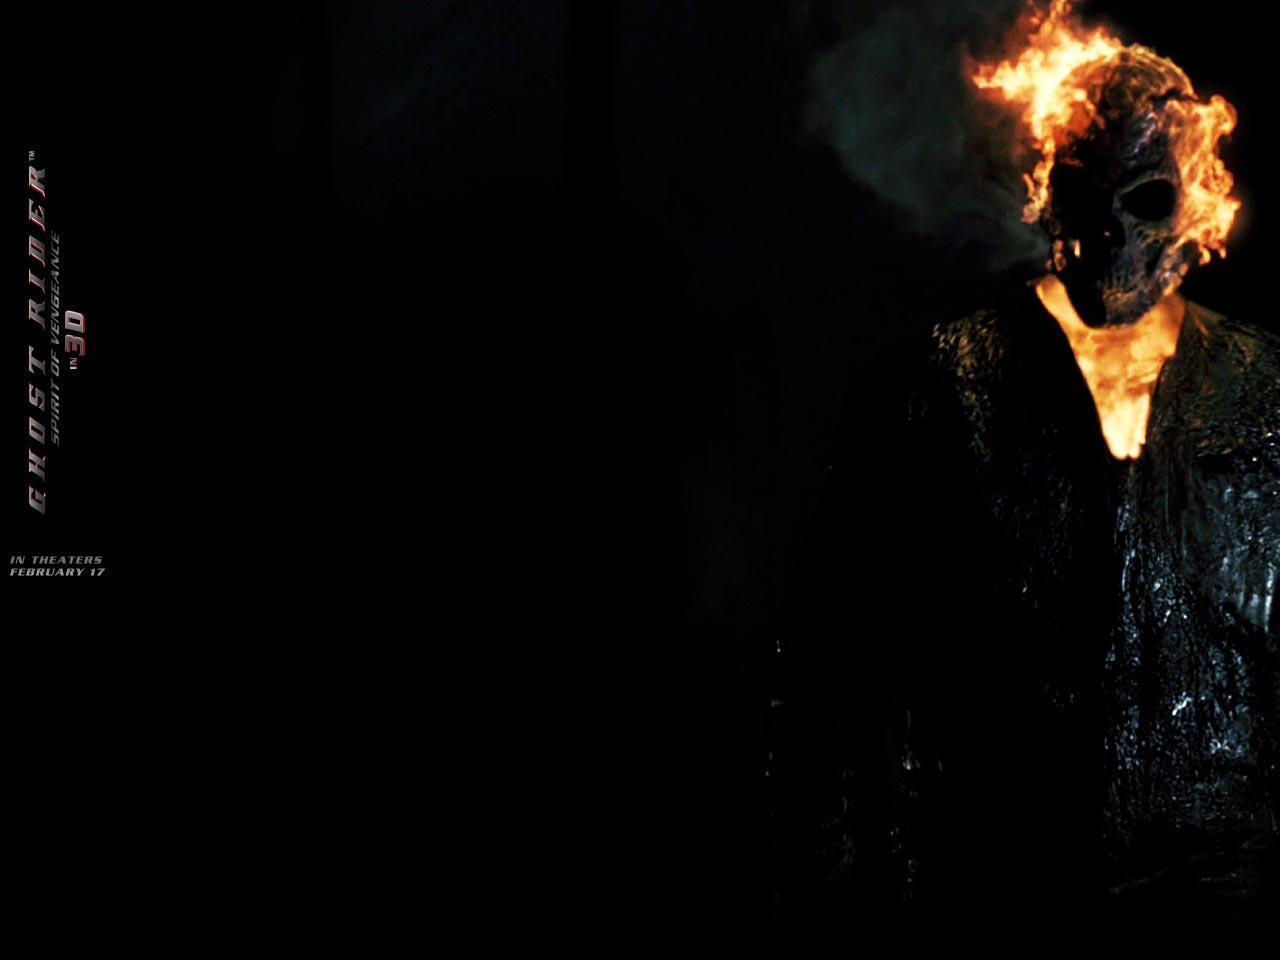 Wallpaper Hd Ghost Rider Ghost Rider Spirit Of Vengeance Wallpapers Filmofilia